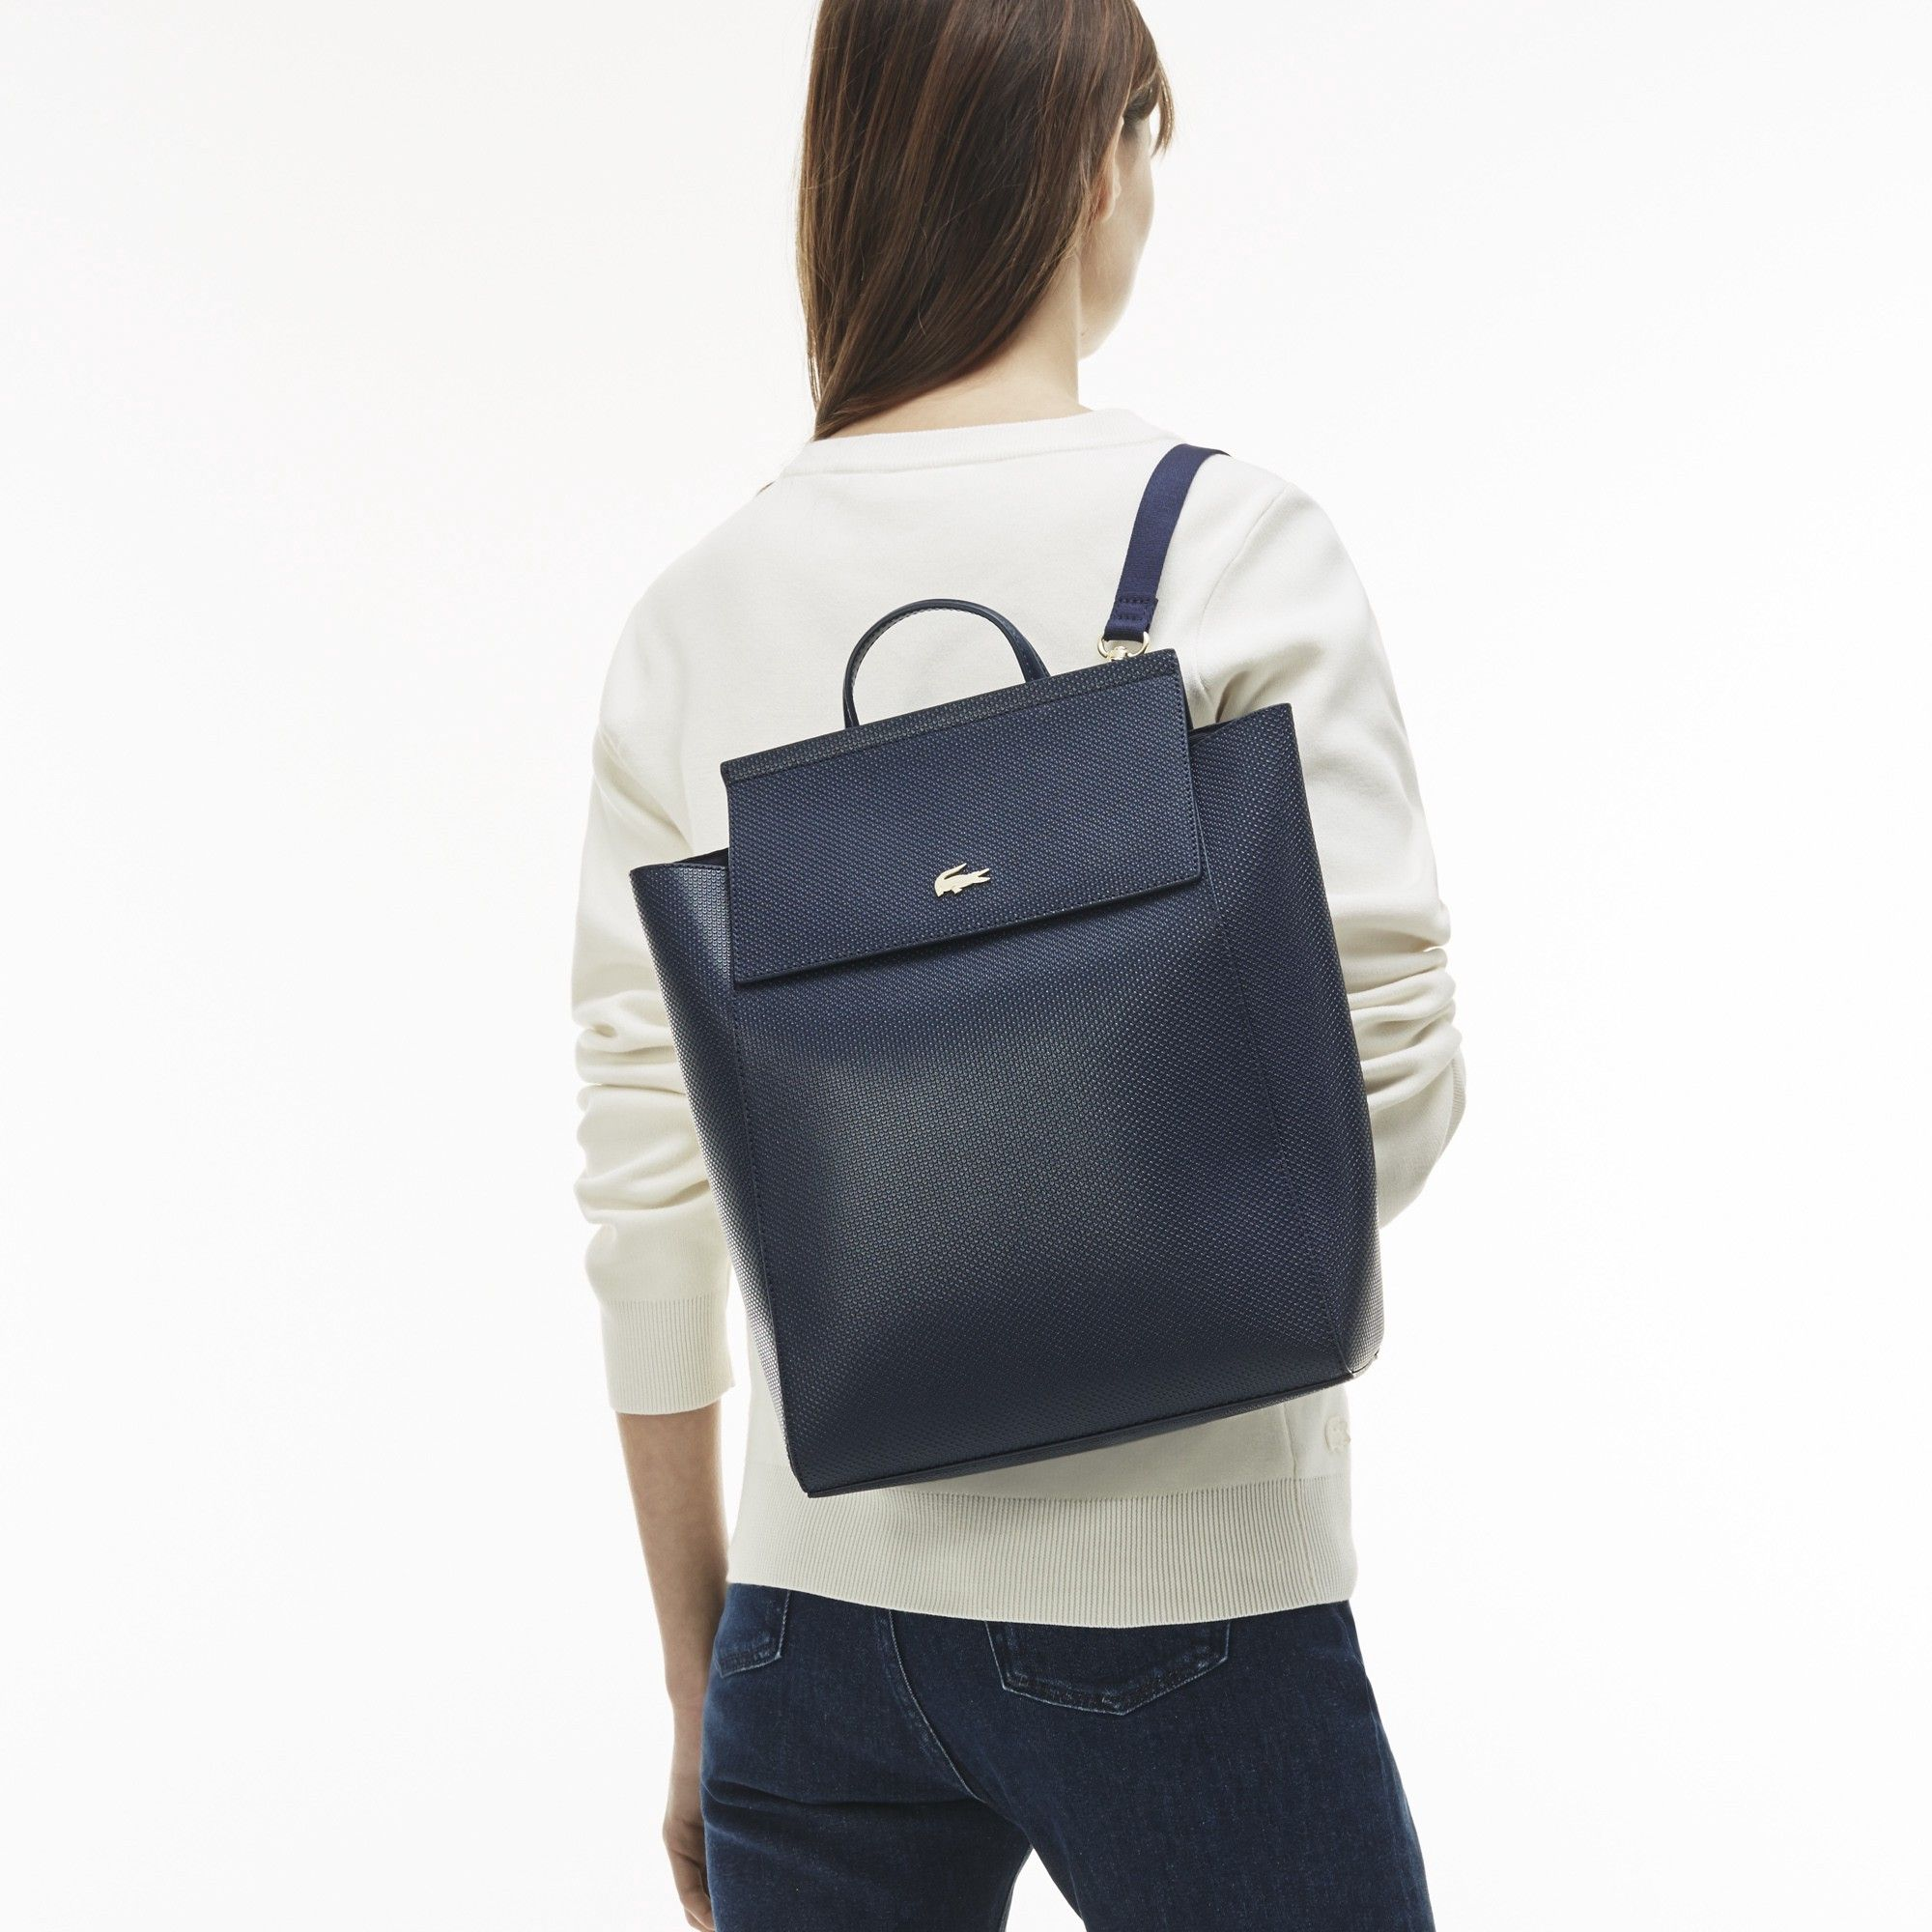 241c50b49f LACOSTE Women'S Chantaco Piqué Leather Backpack - Black ...